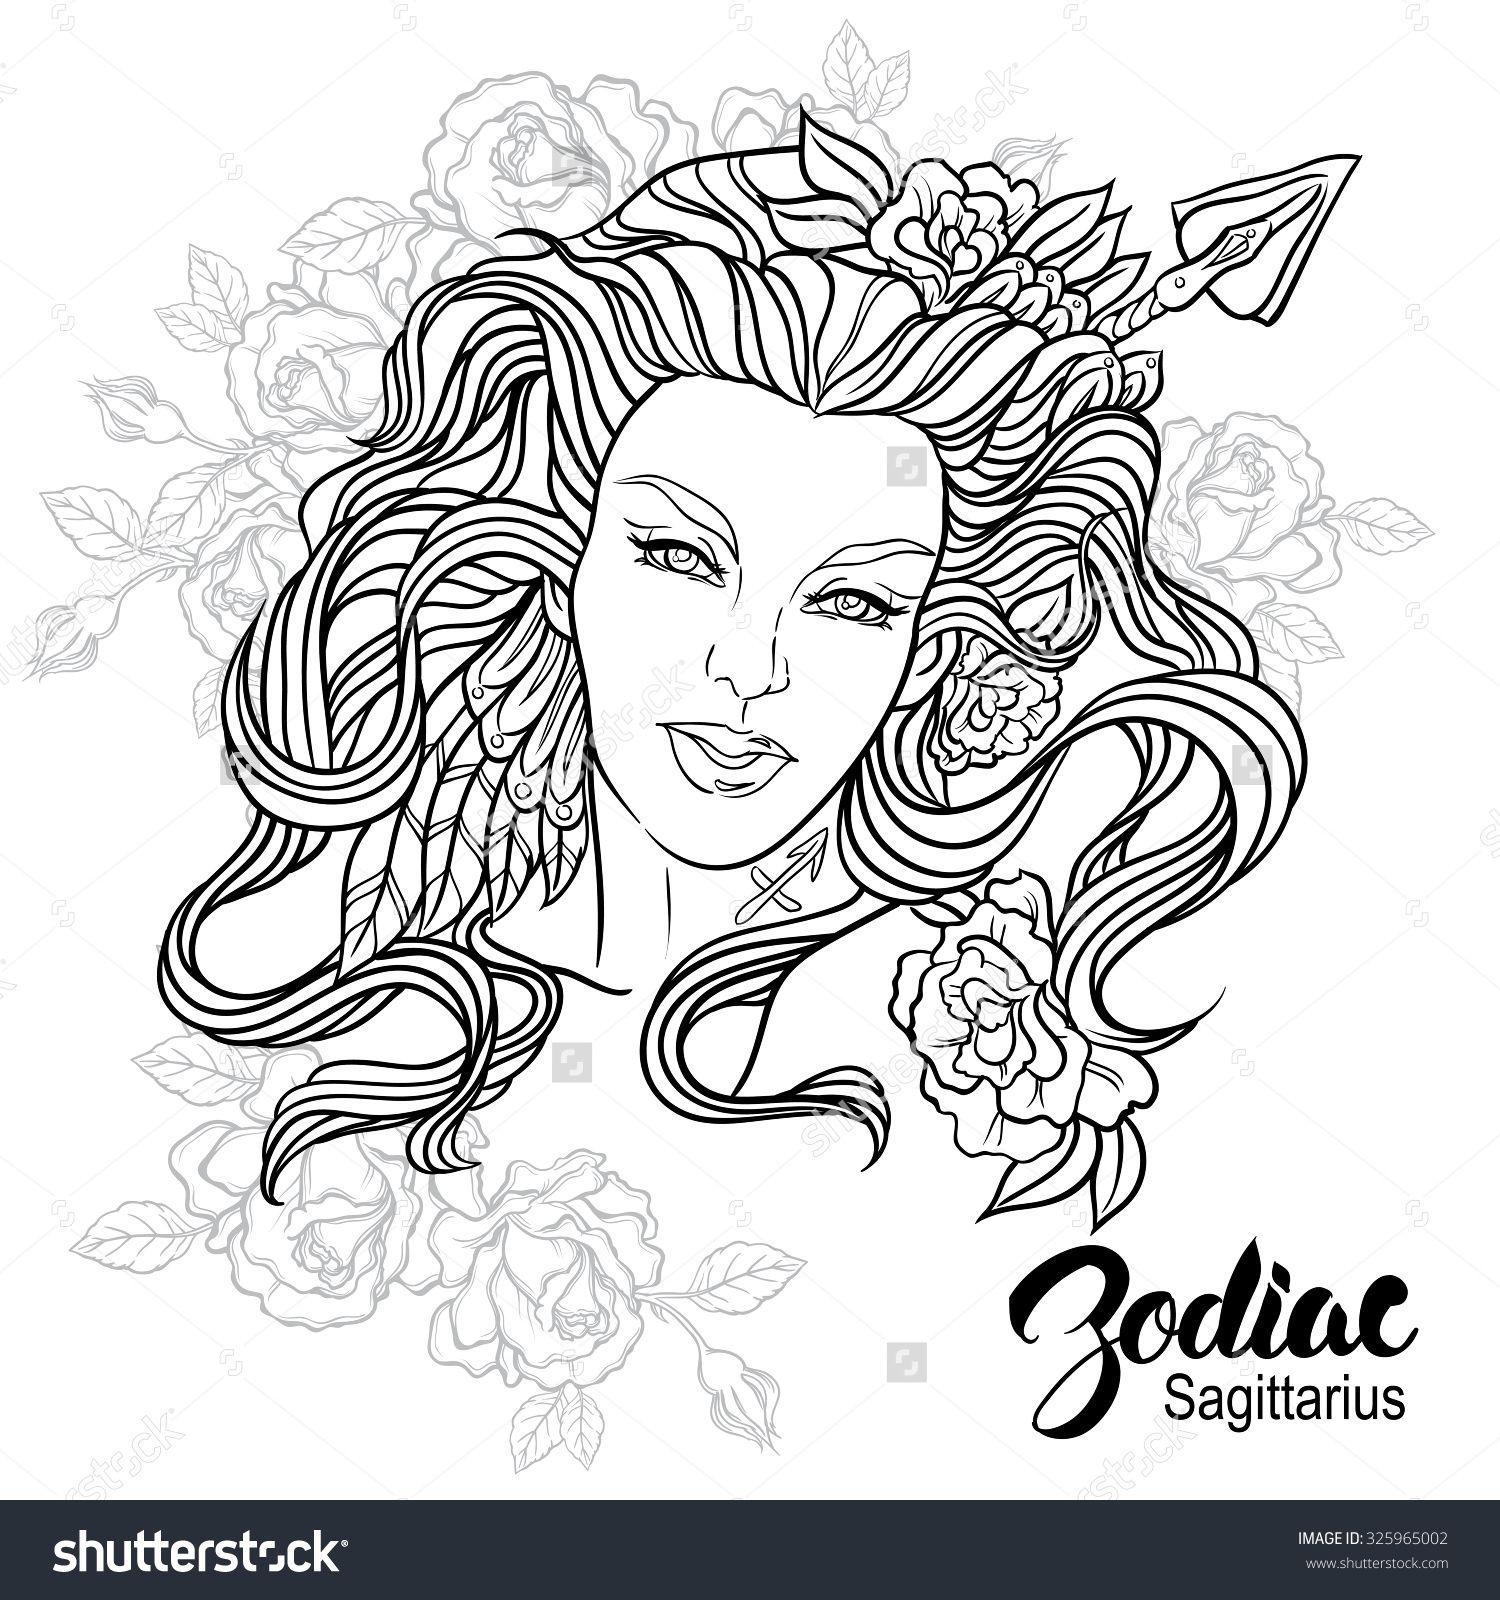 Zodiac. Vector illustration of Sagittarius as girl with flowers